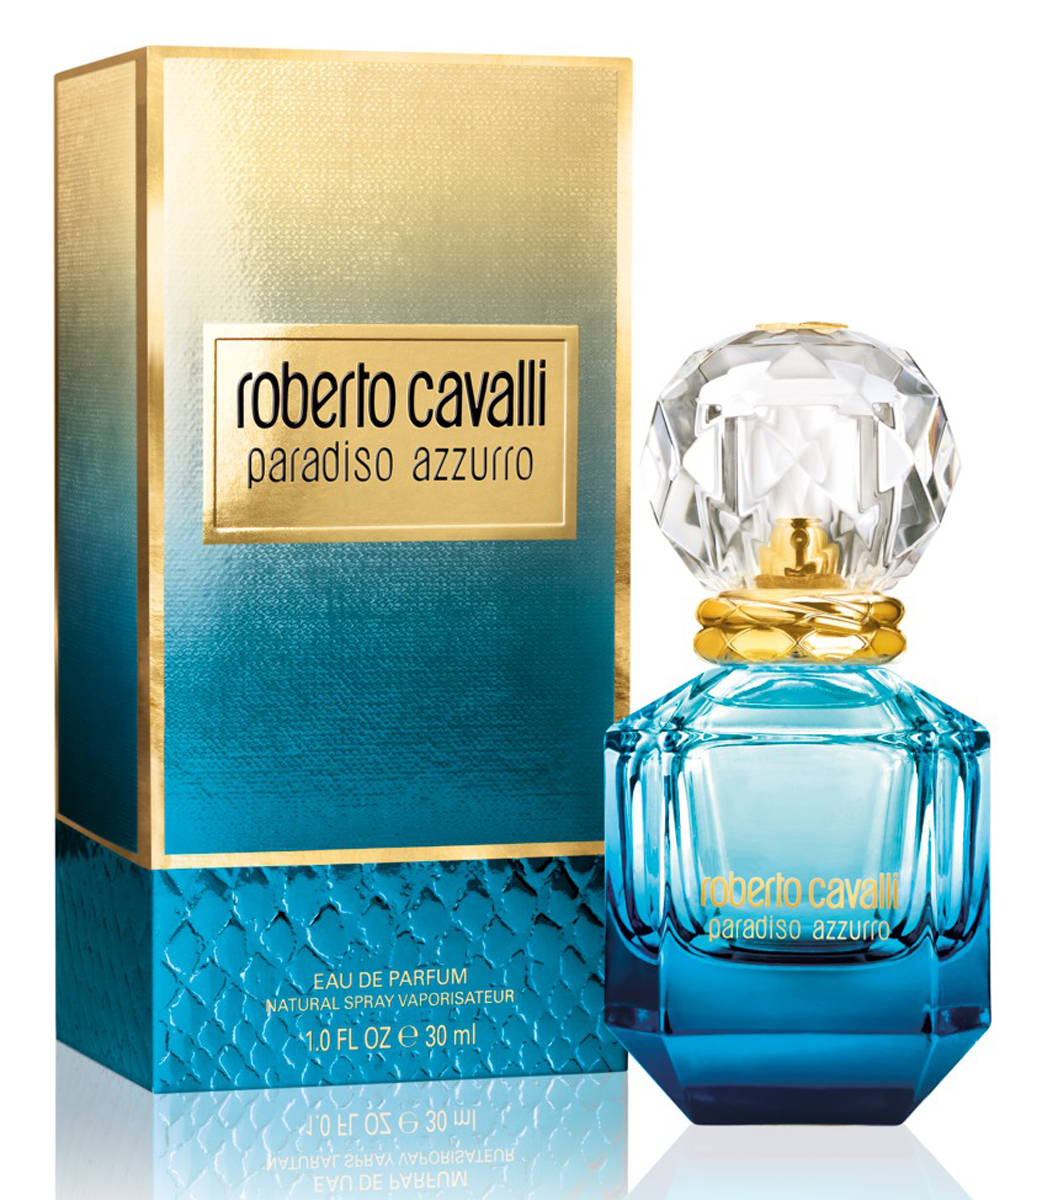 Roberto Cavalli Paradiso Azzurro Парфюмерная вода женская 30 мл